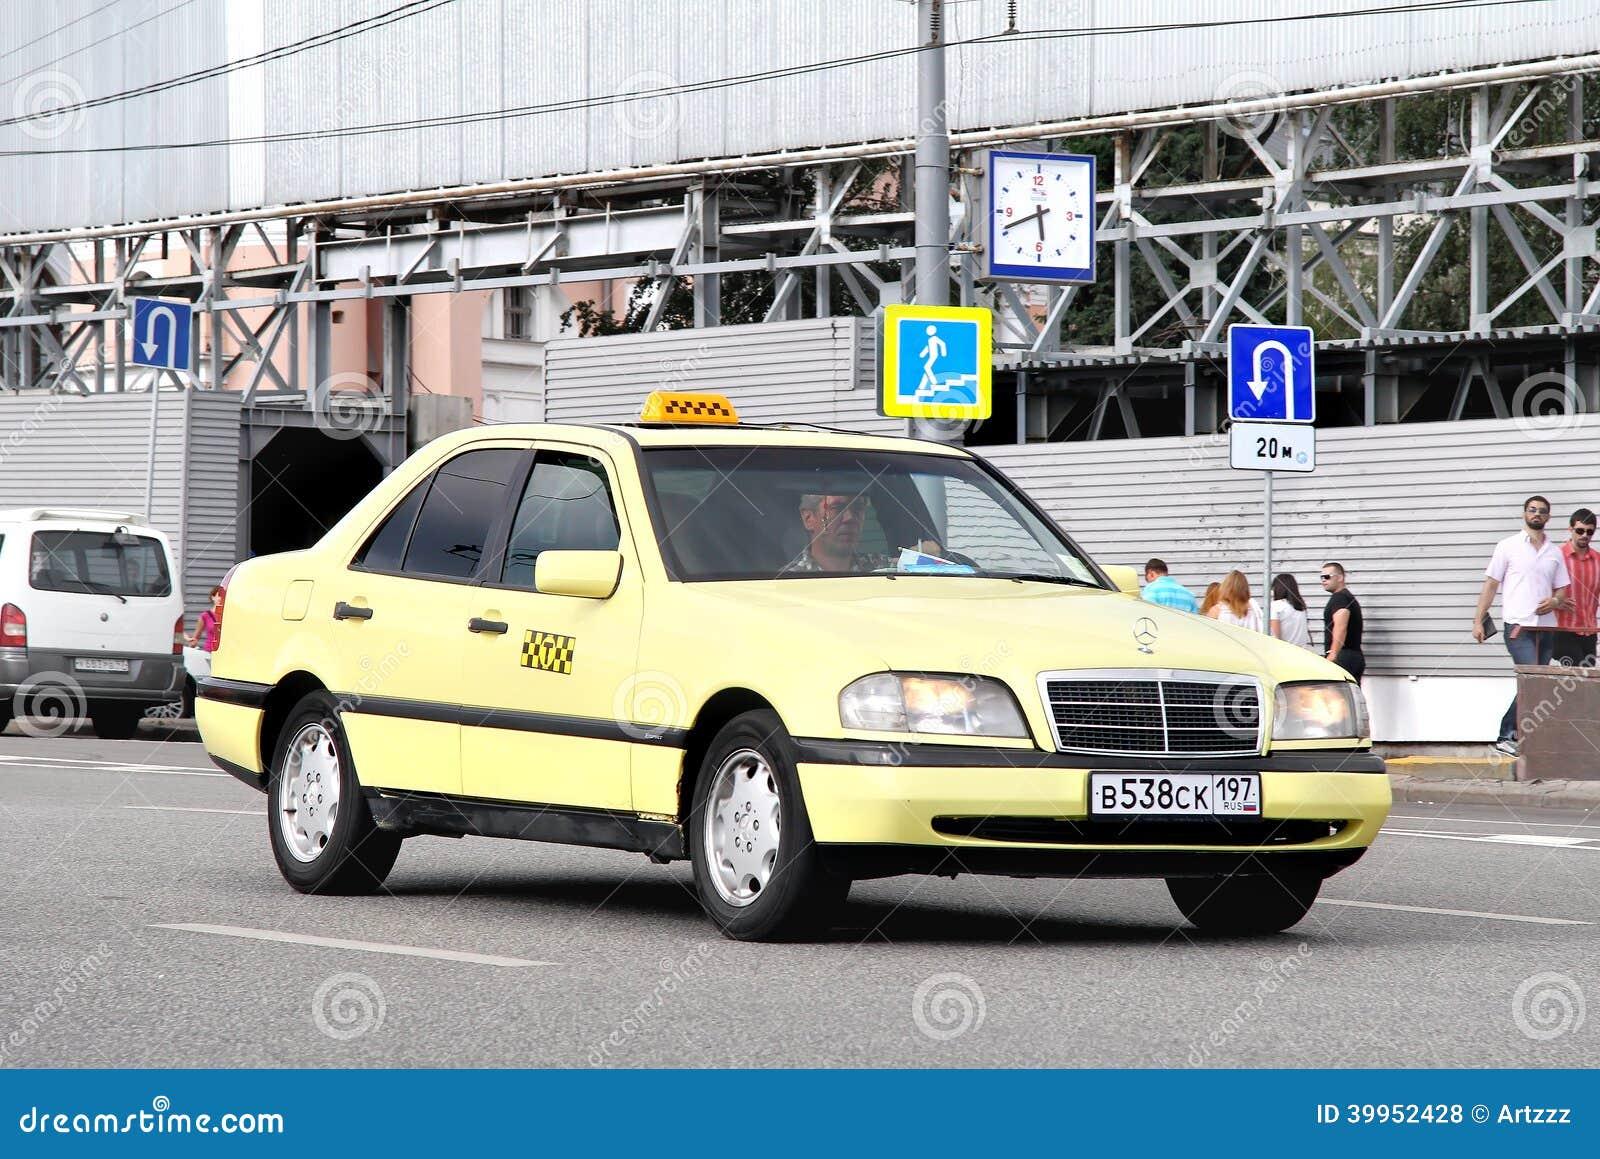 Mercedes Benz W202 C Class Editorial Stock Photo Image